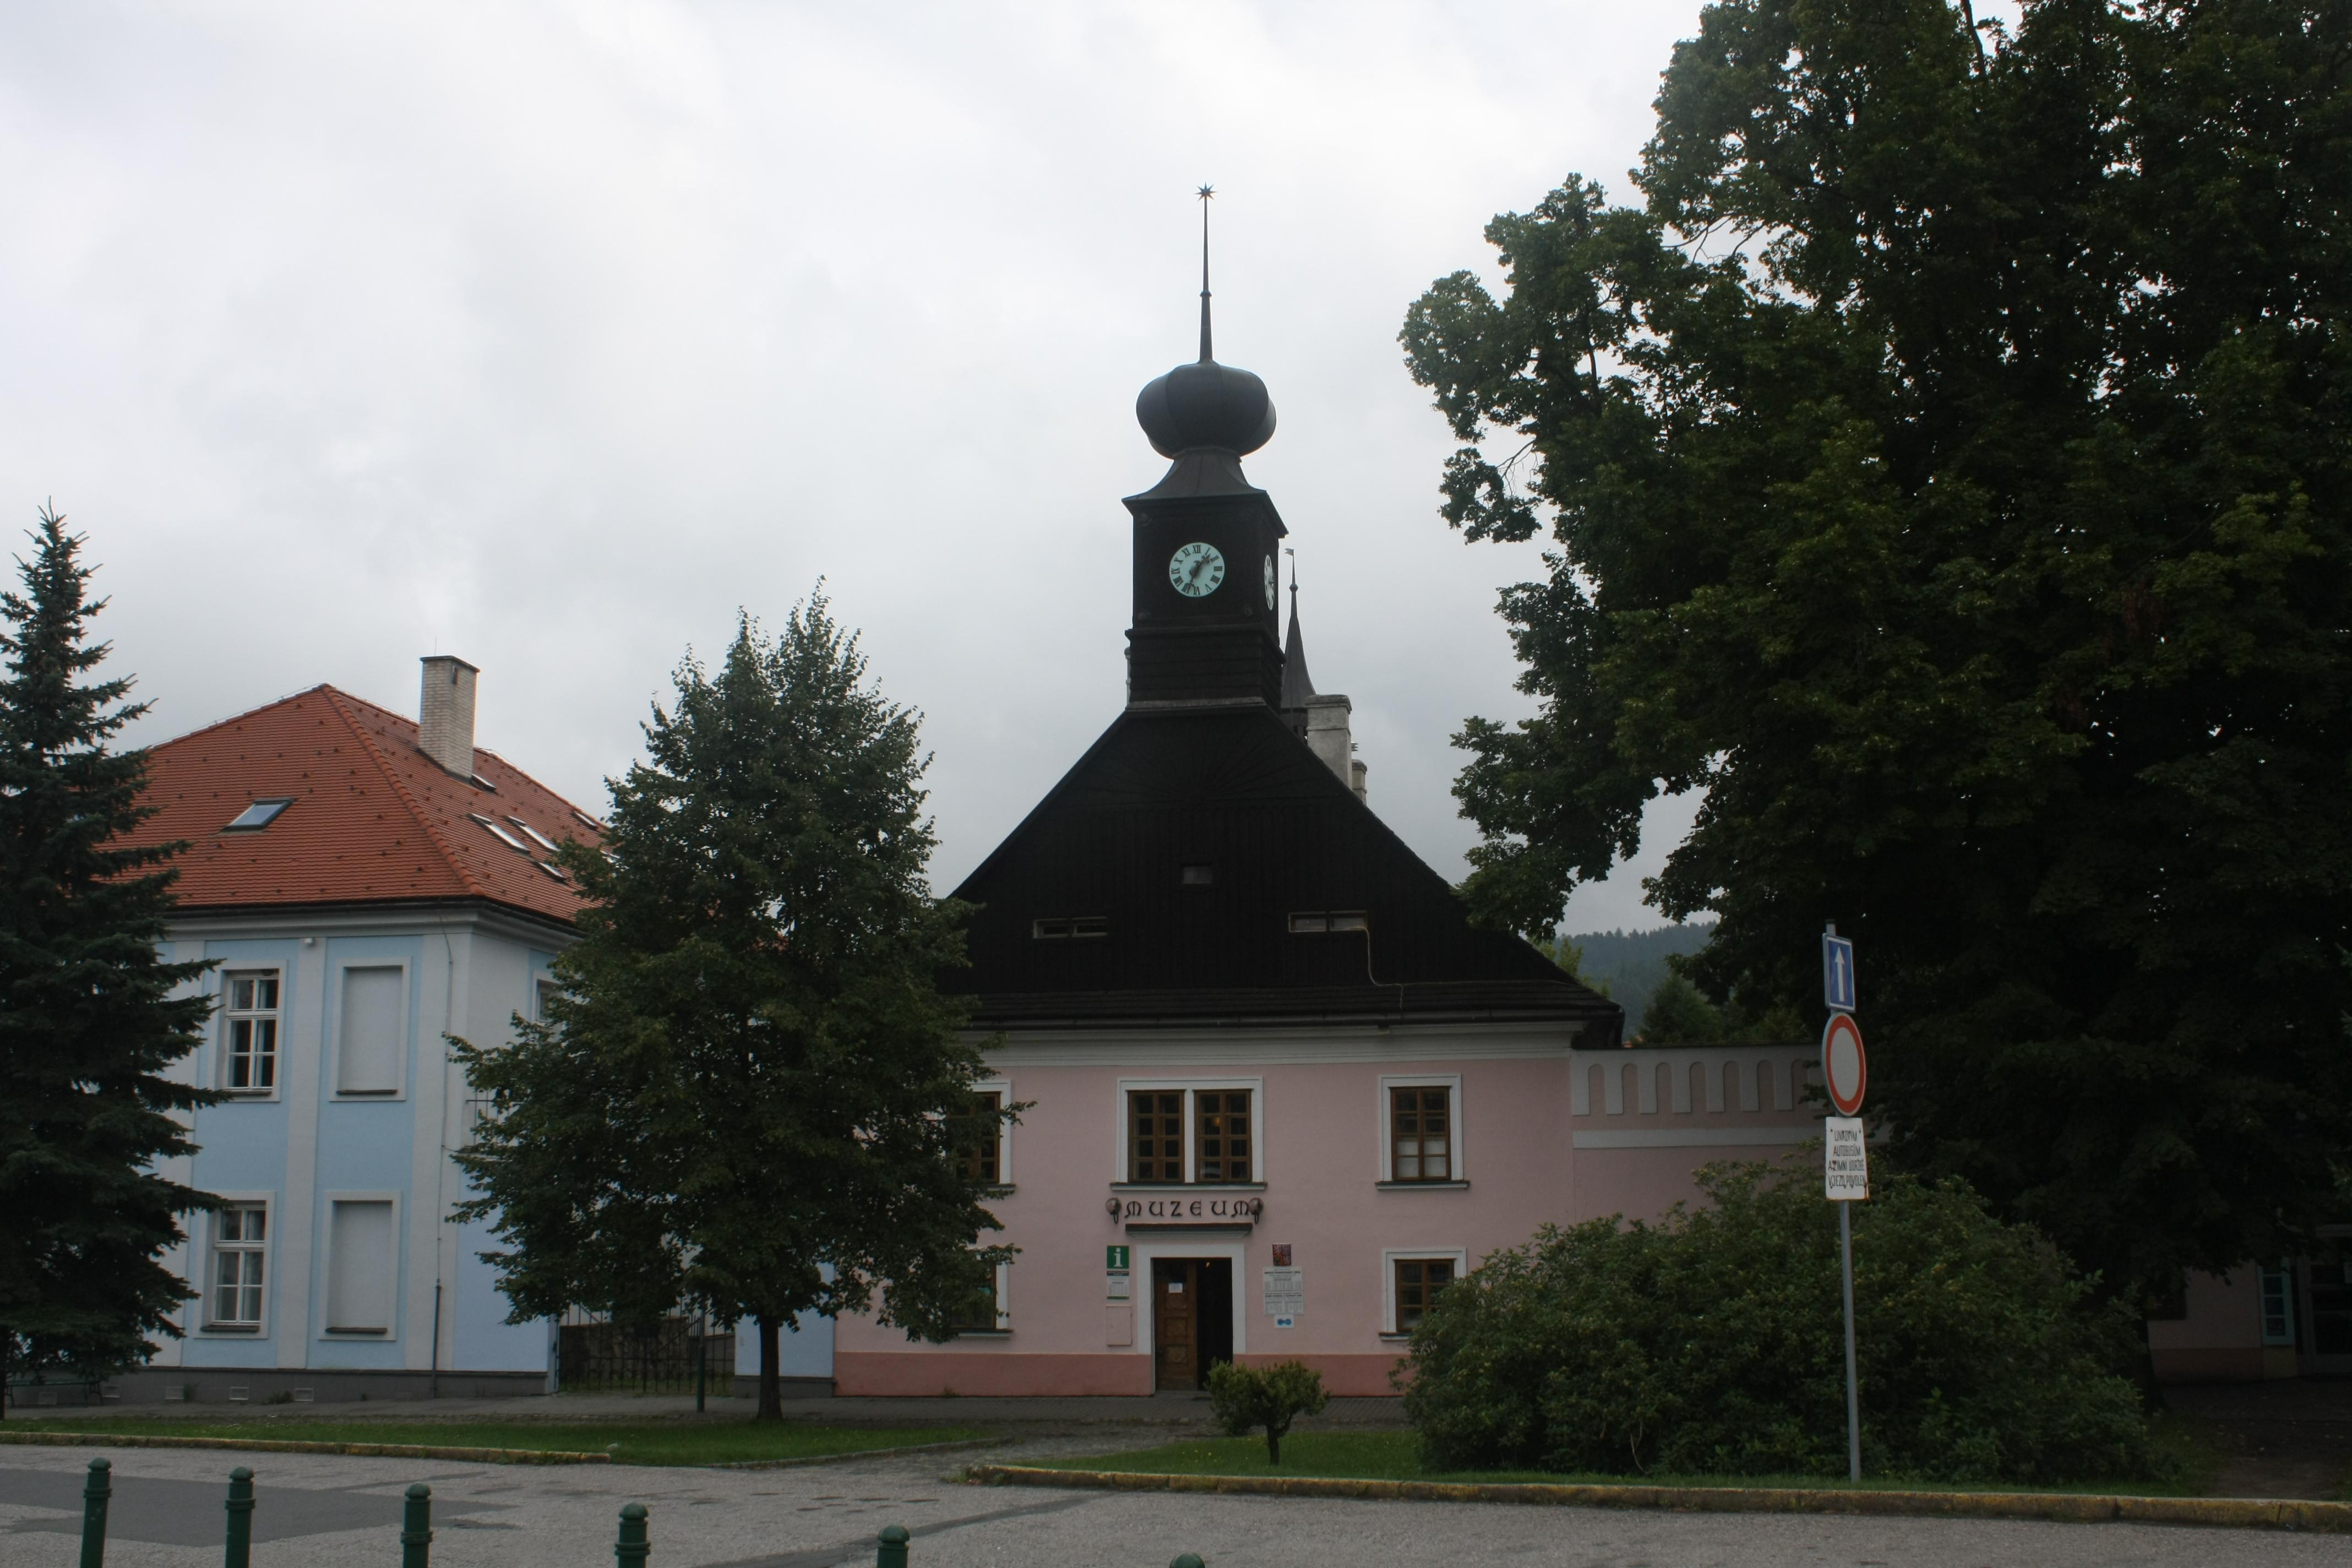 Soubor Valašské Klobouky (7).jpg – Wikipedie b604e6ca80